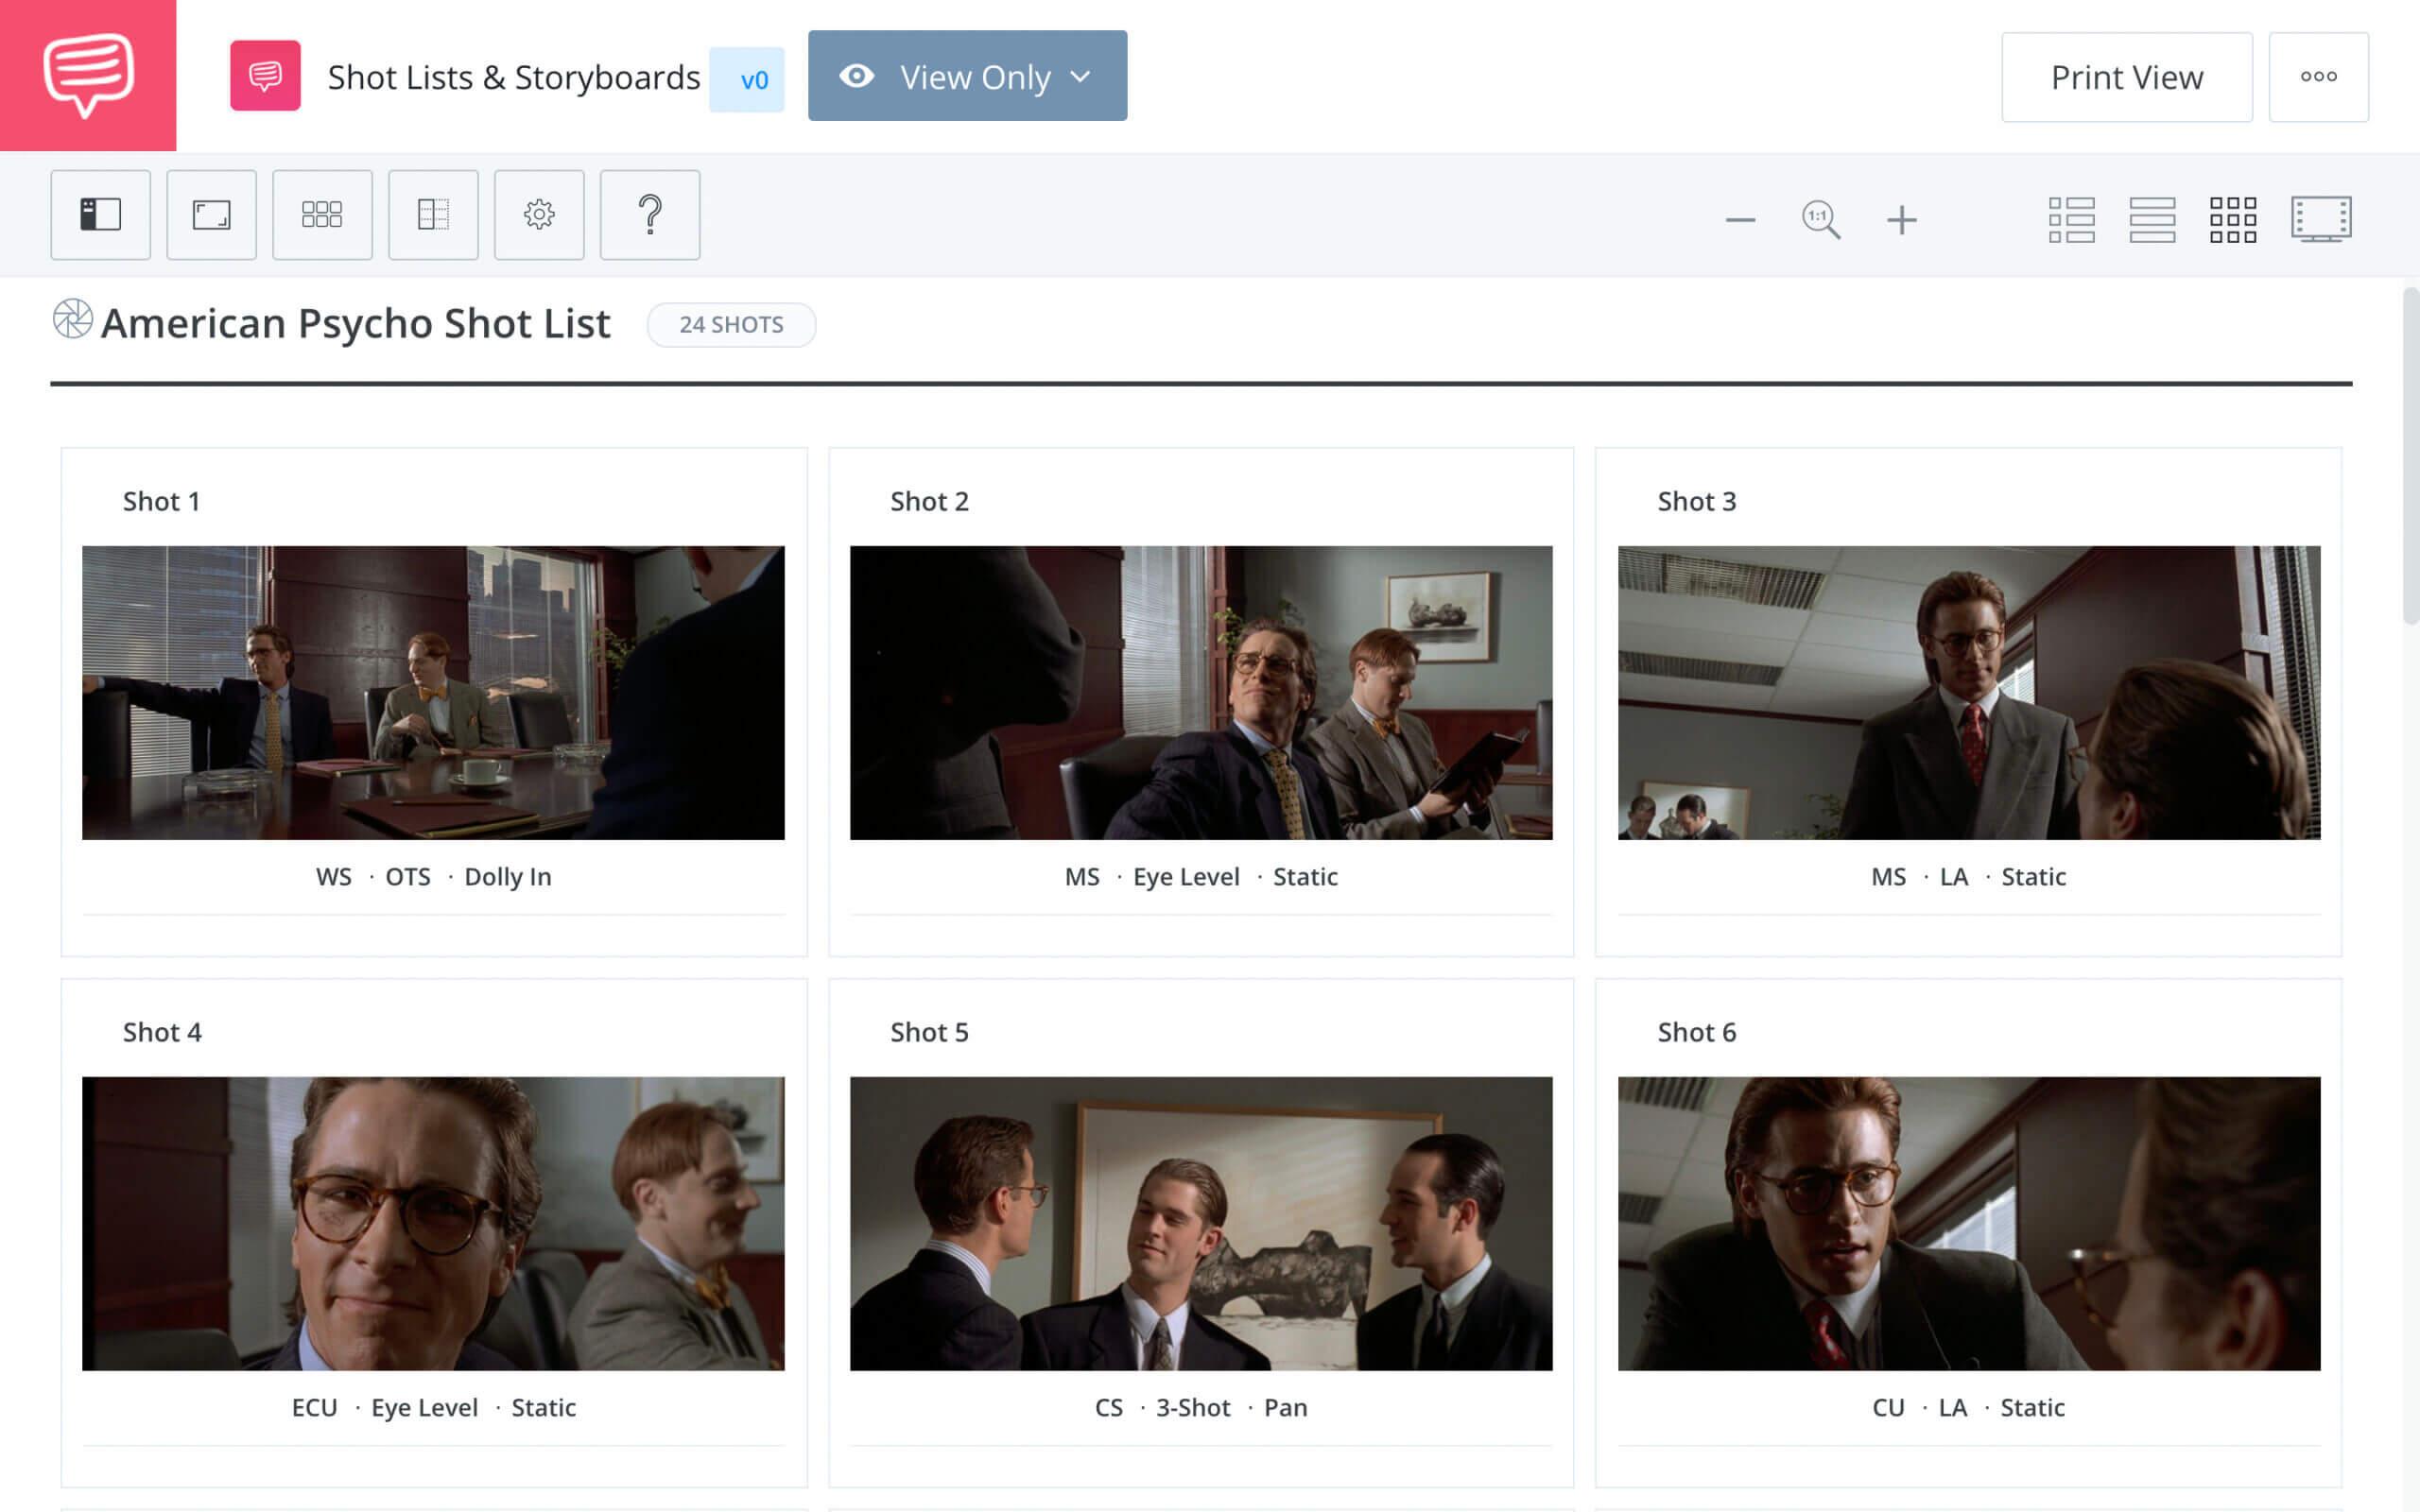 American Psycho Business Card Scene Business Card Scene StudioBinder Shot Listing Software